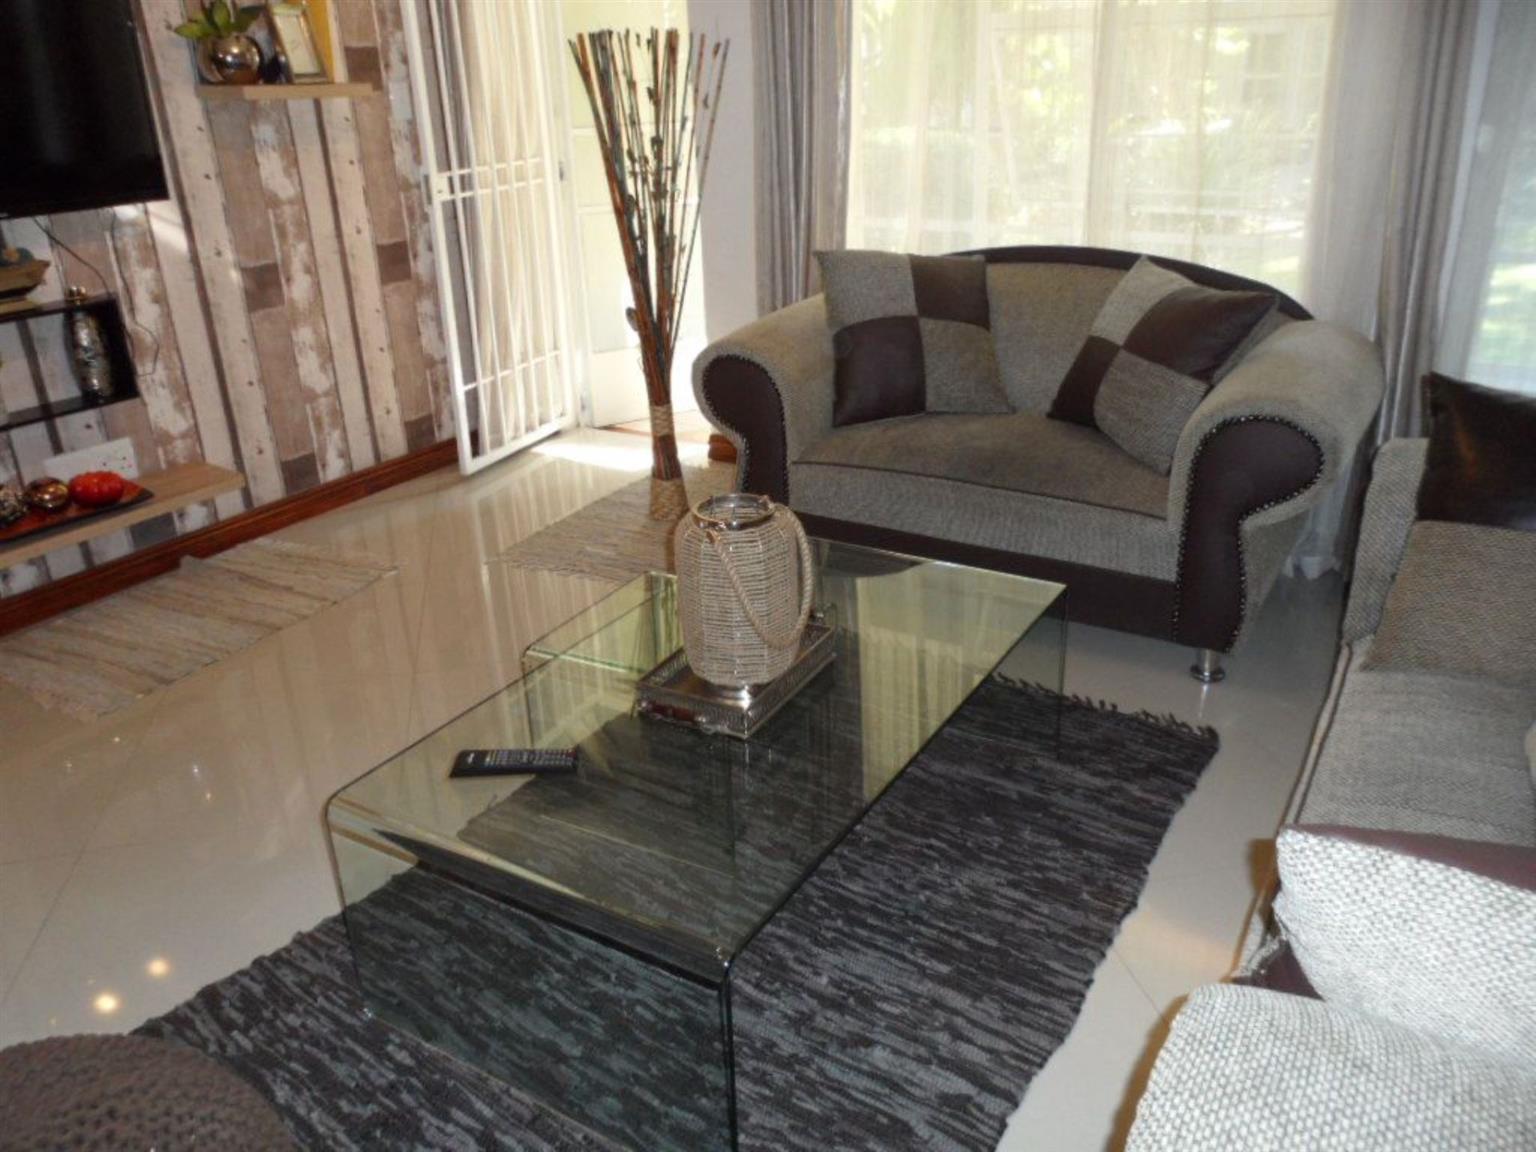 Apartment Rental Monthly in BENMORE